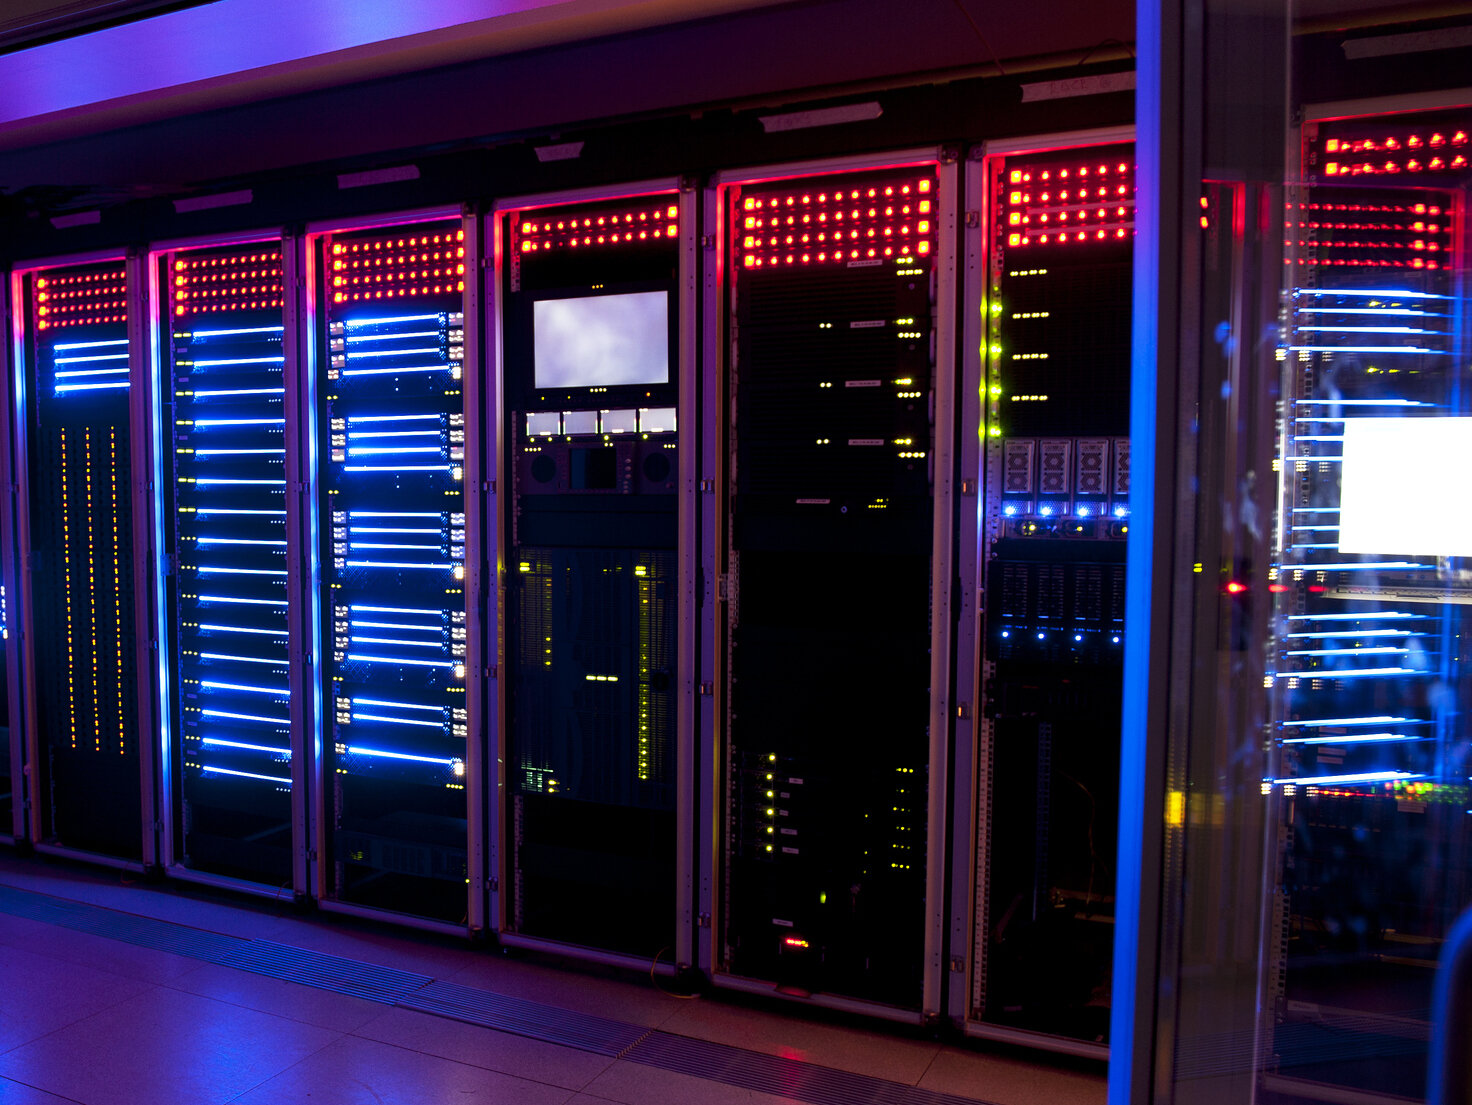 Top500 des supercalculateurs : Fugaku accroit son avance, AMD continue son offensive